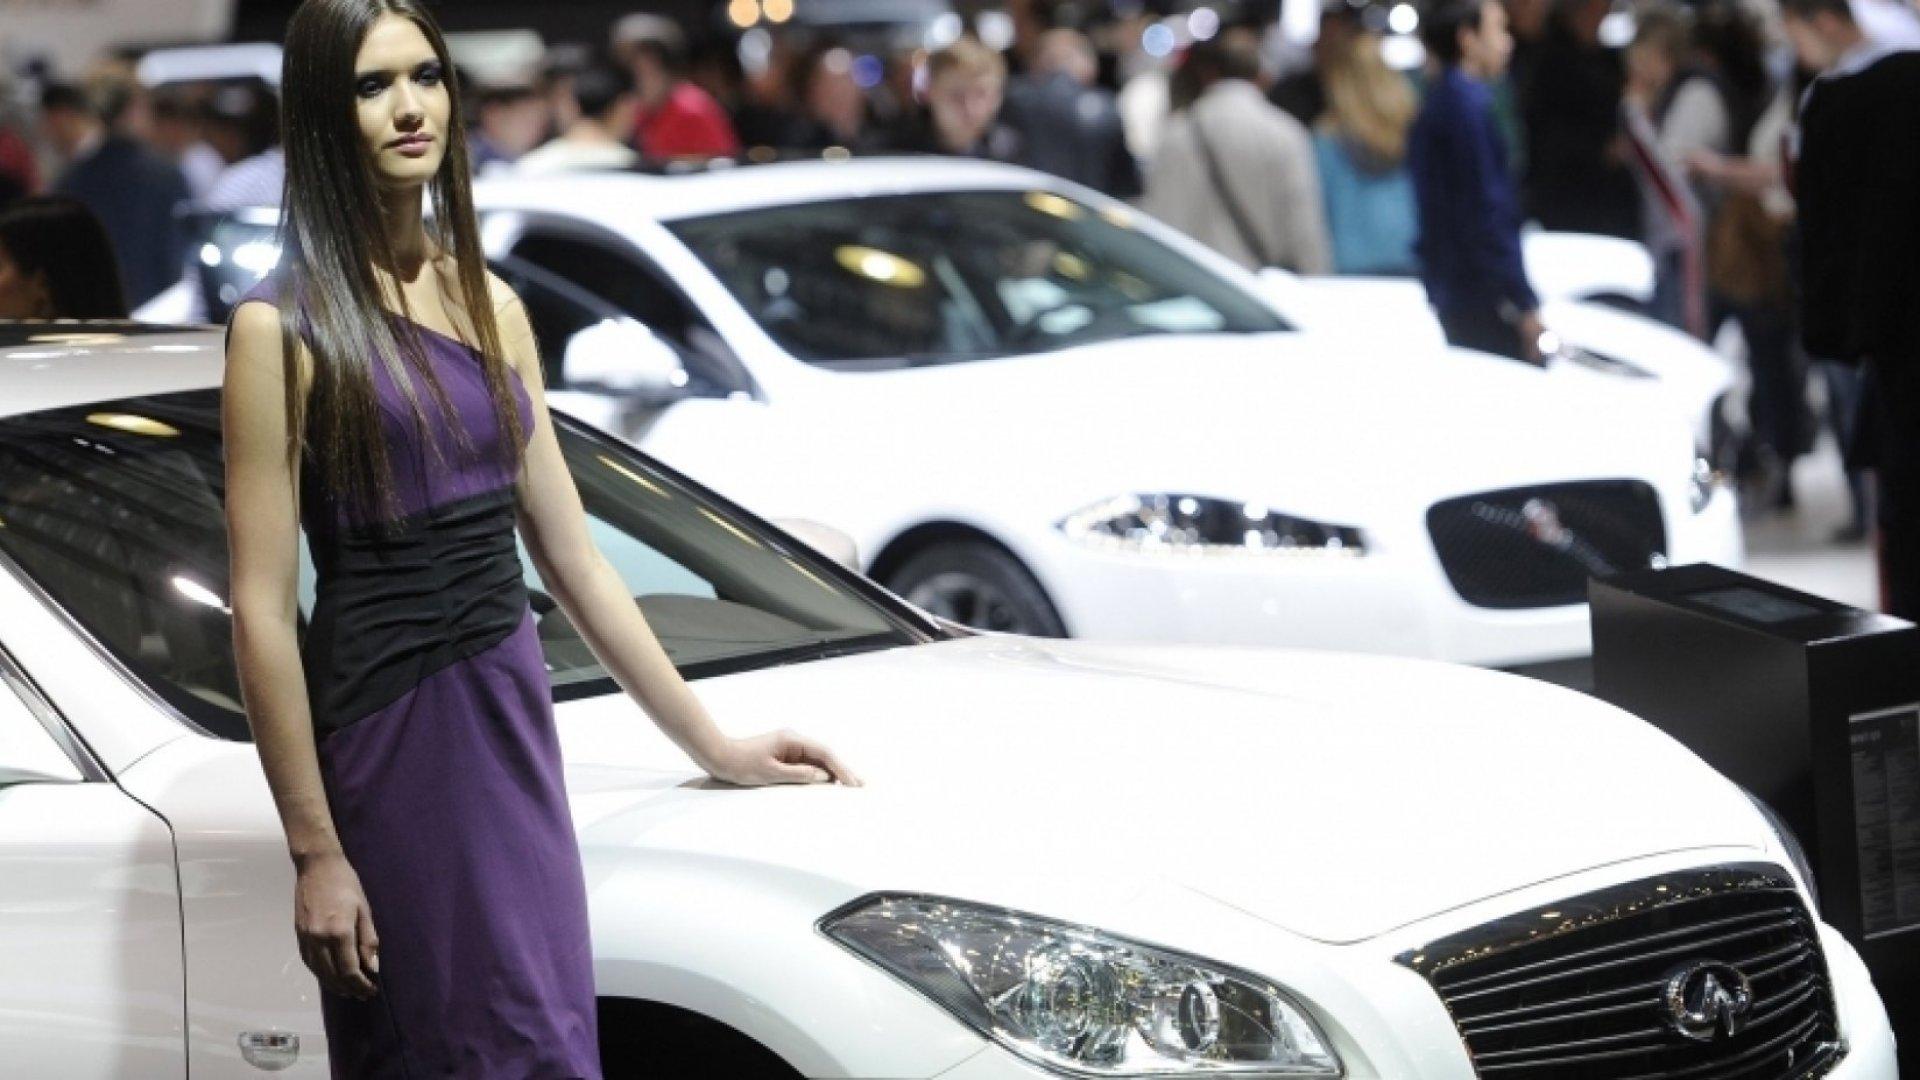 Reviewed: 2015 Infiniti Q70L is a Roomy Business Sedan